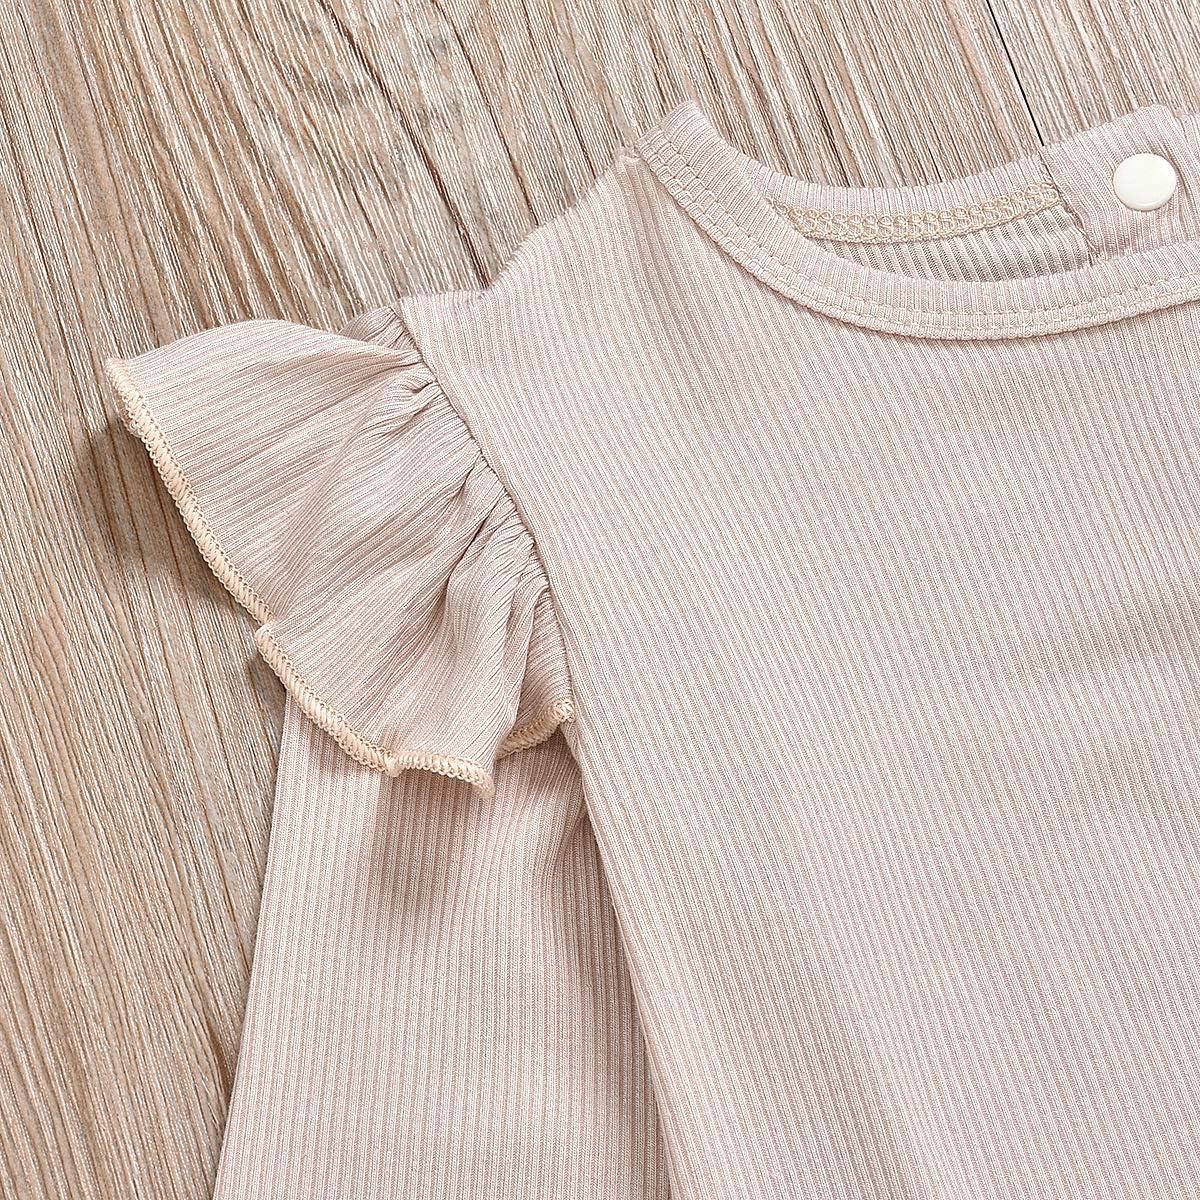 Newborn Baby Girls Outfits Striped Shirt+Leopard Lace Suspender Shorts Short Set